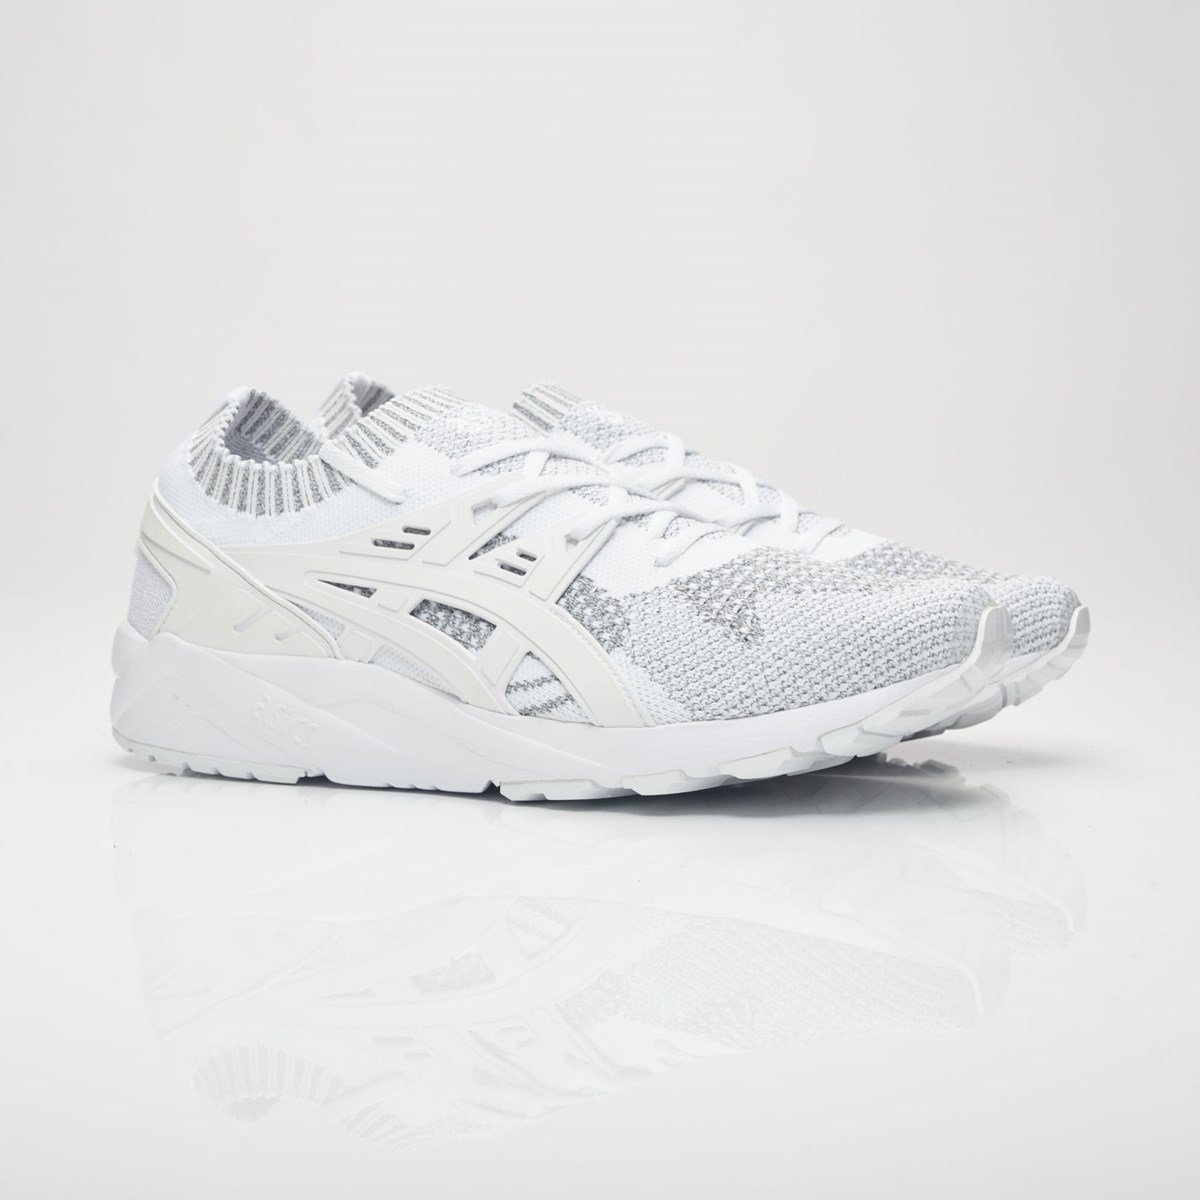 sports shoes 623cd 3acd4 asics tiger gel kayano trainer knit h7s3n 9301 sneakers   streetwear på  nätet sen .